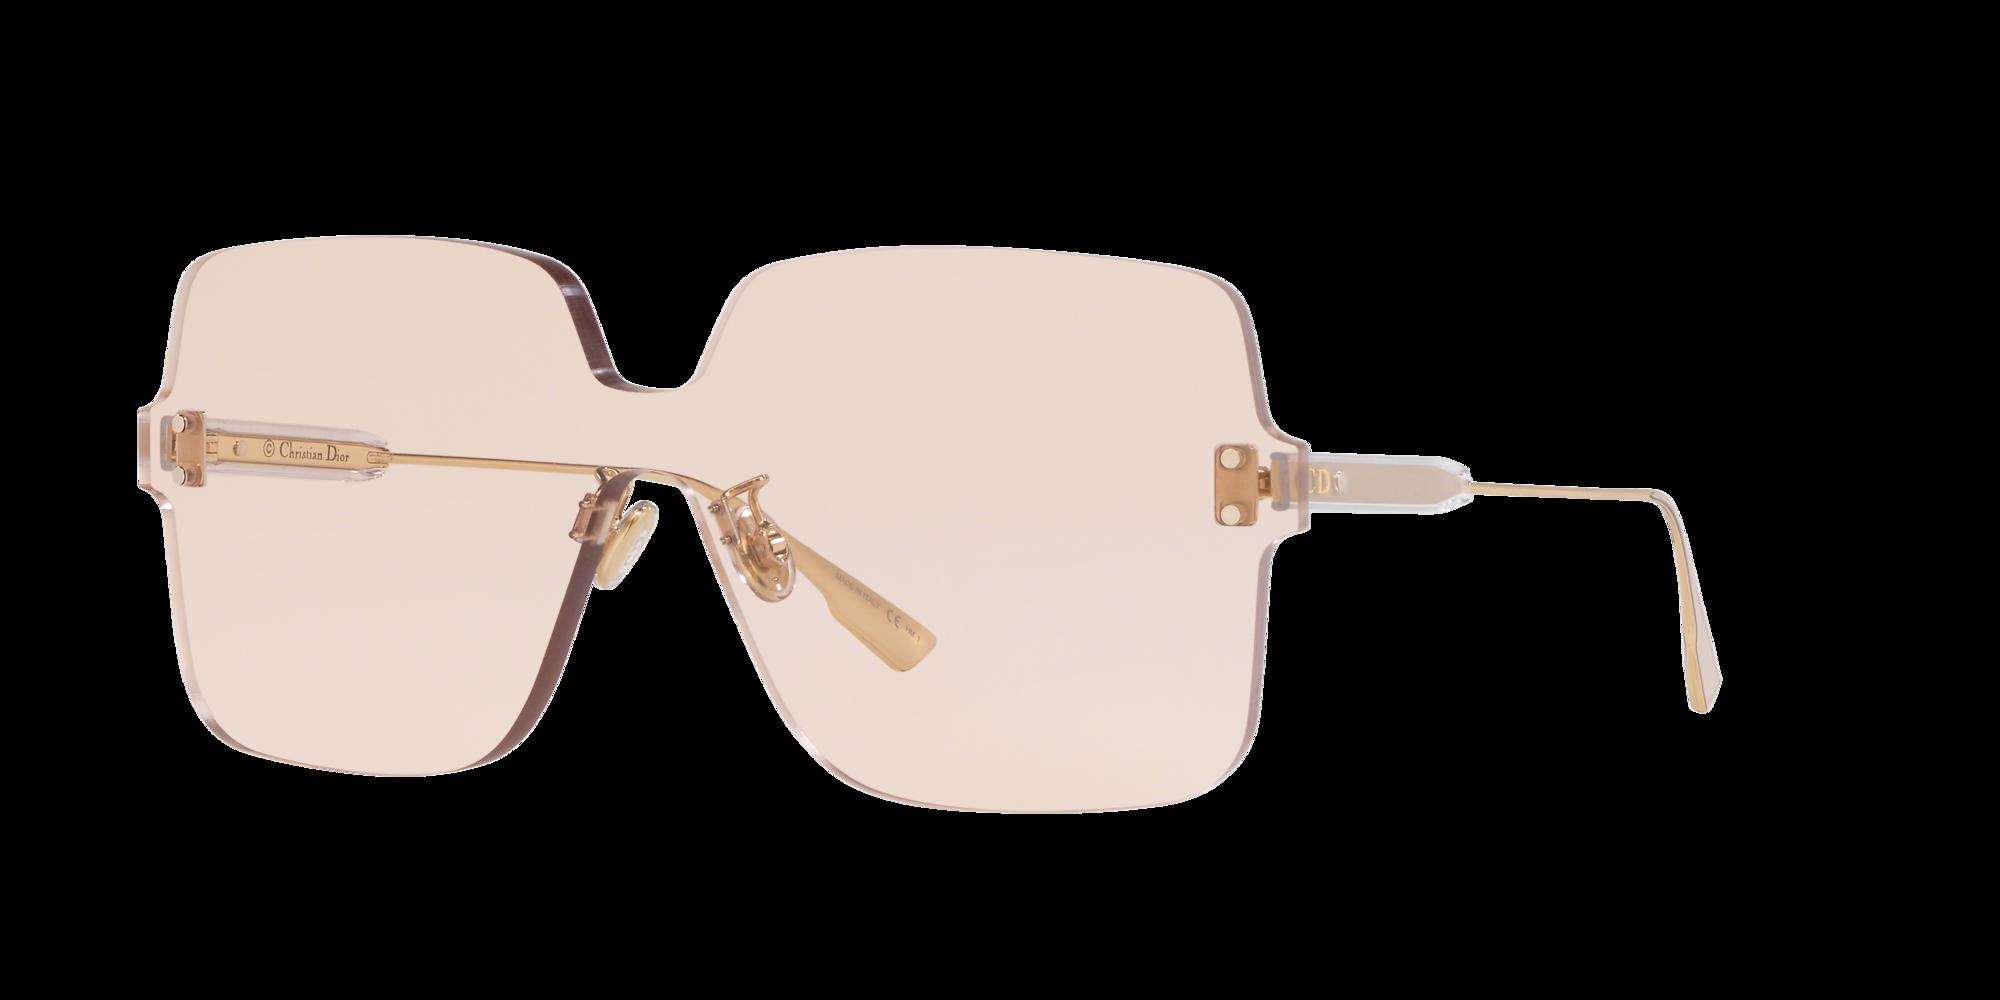 Dior Woman  DIORCOLORQUAKE1 -  Frame color: Pink, Lens color: Pink